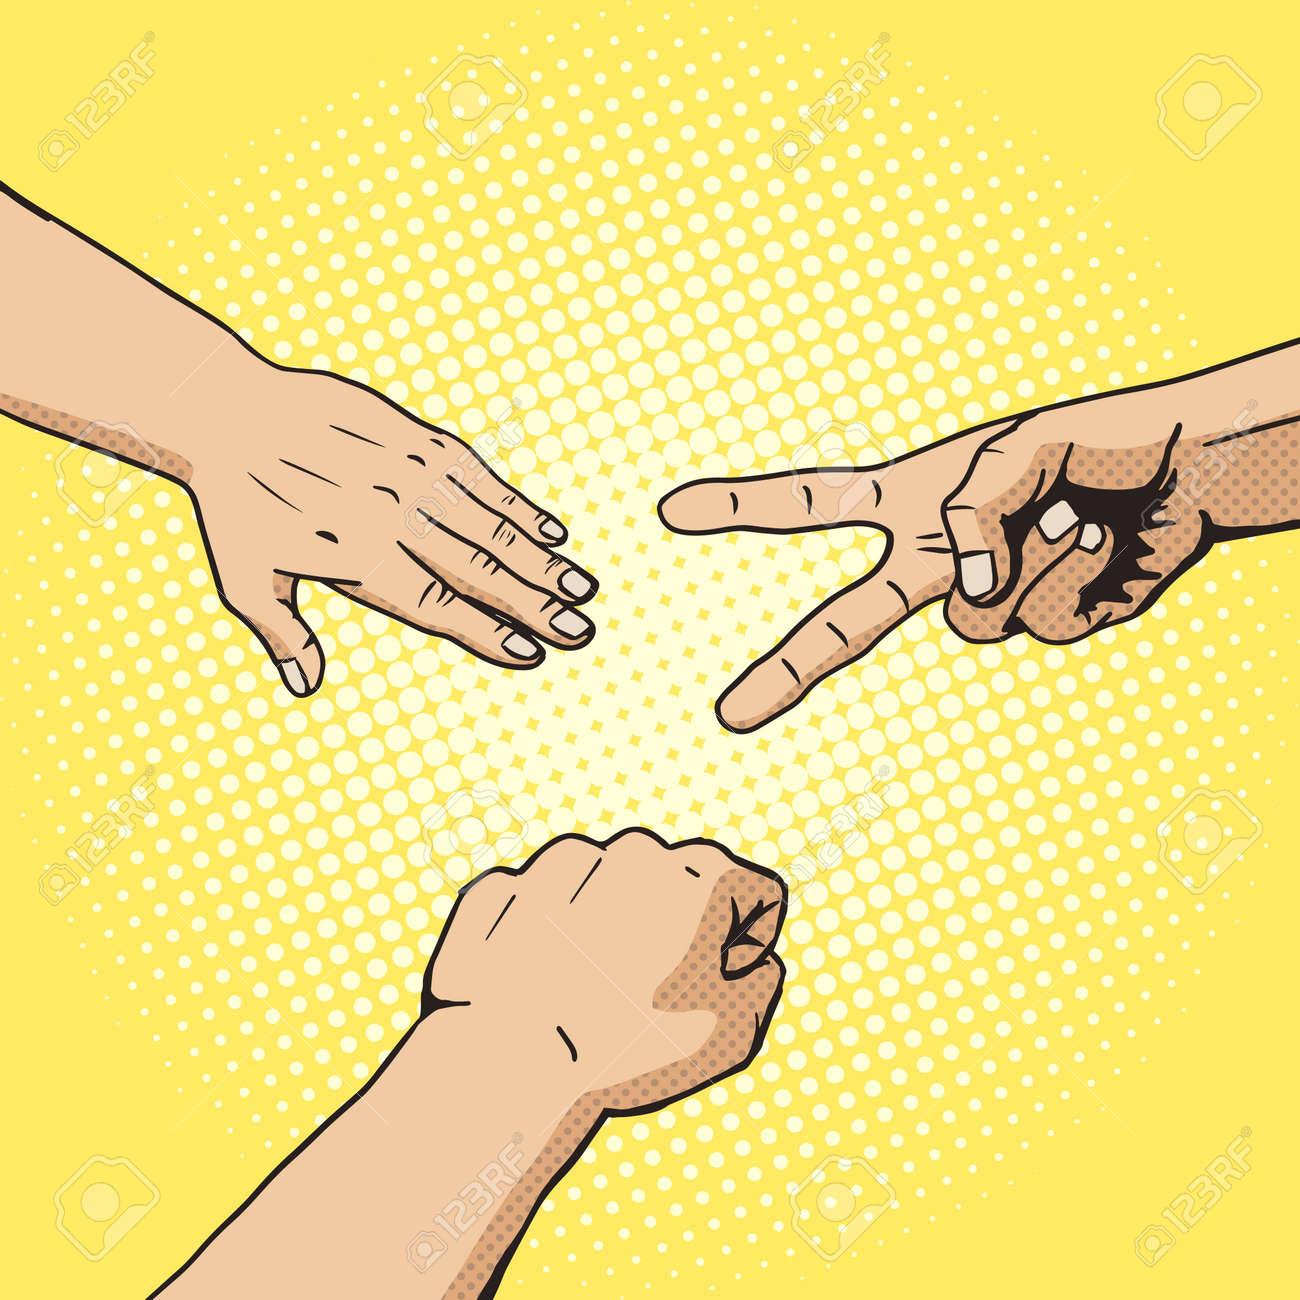 Rock paper scissors hand game pop art style vector. Comic book style imitation. Vintage retro style. Conceptual illustration - 51614376